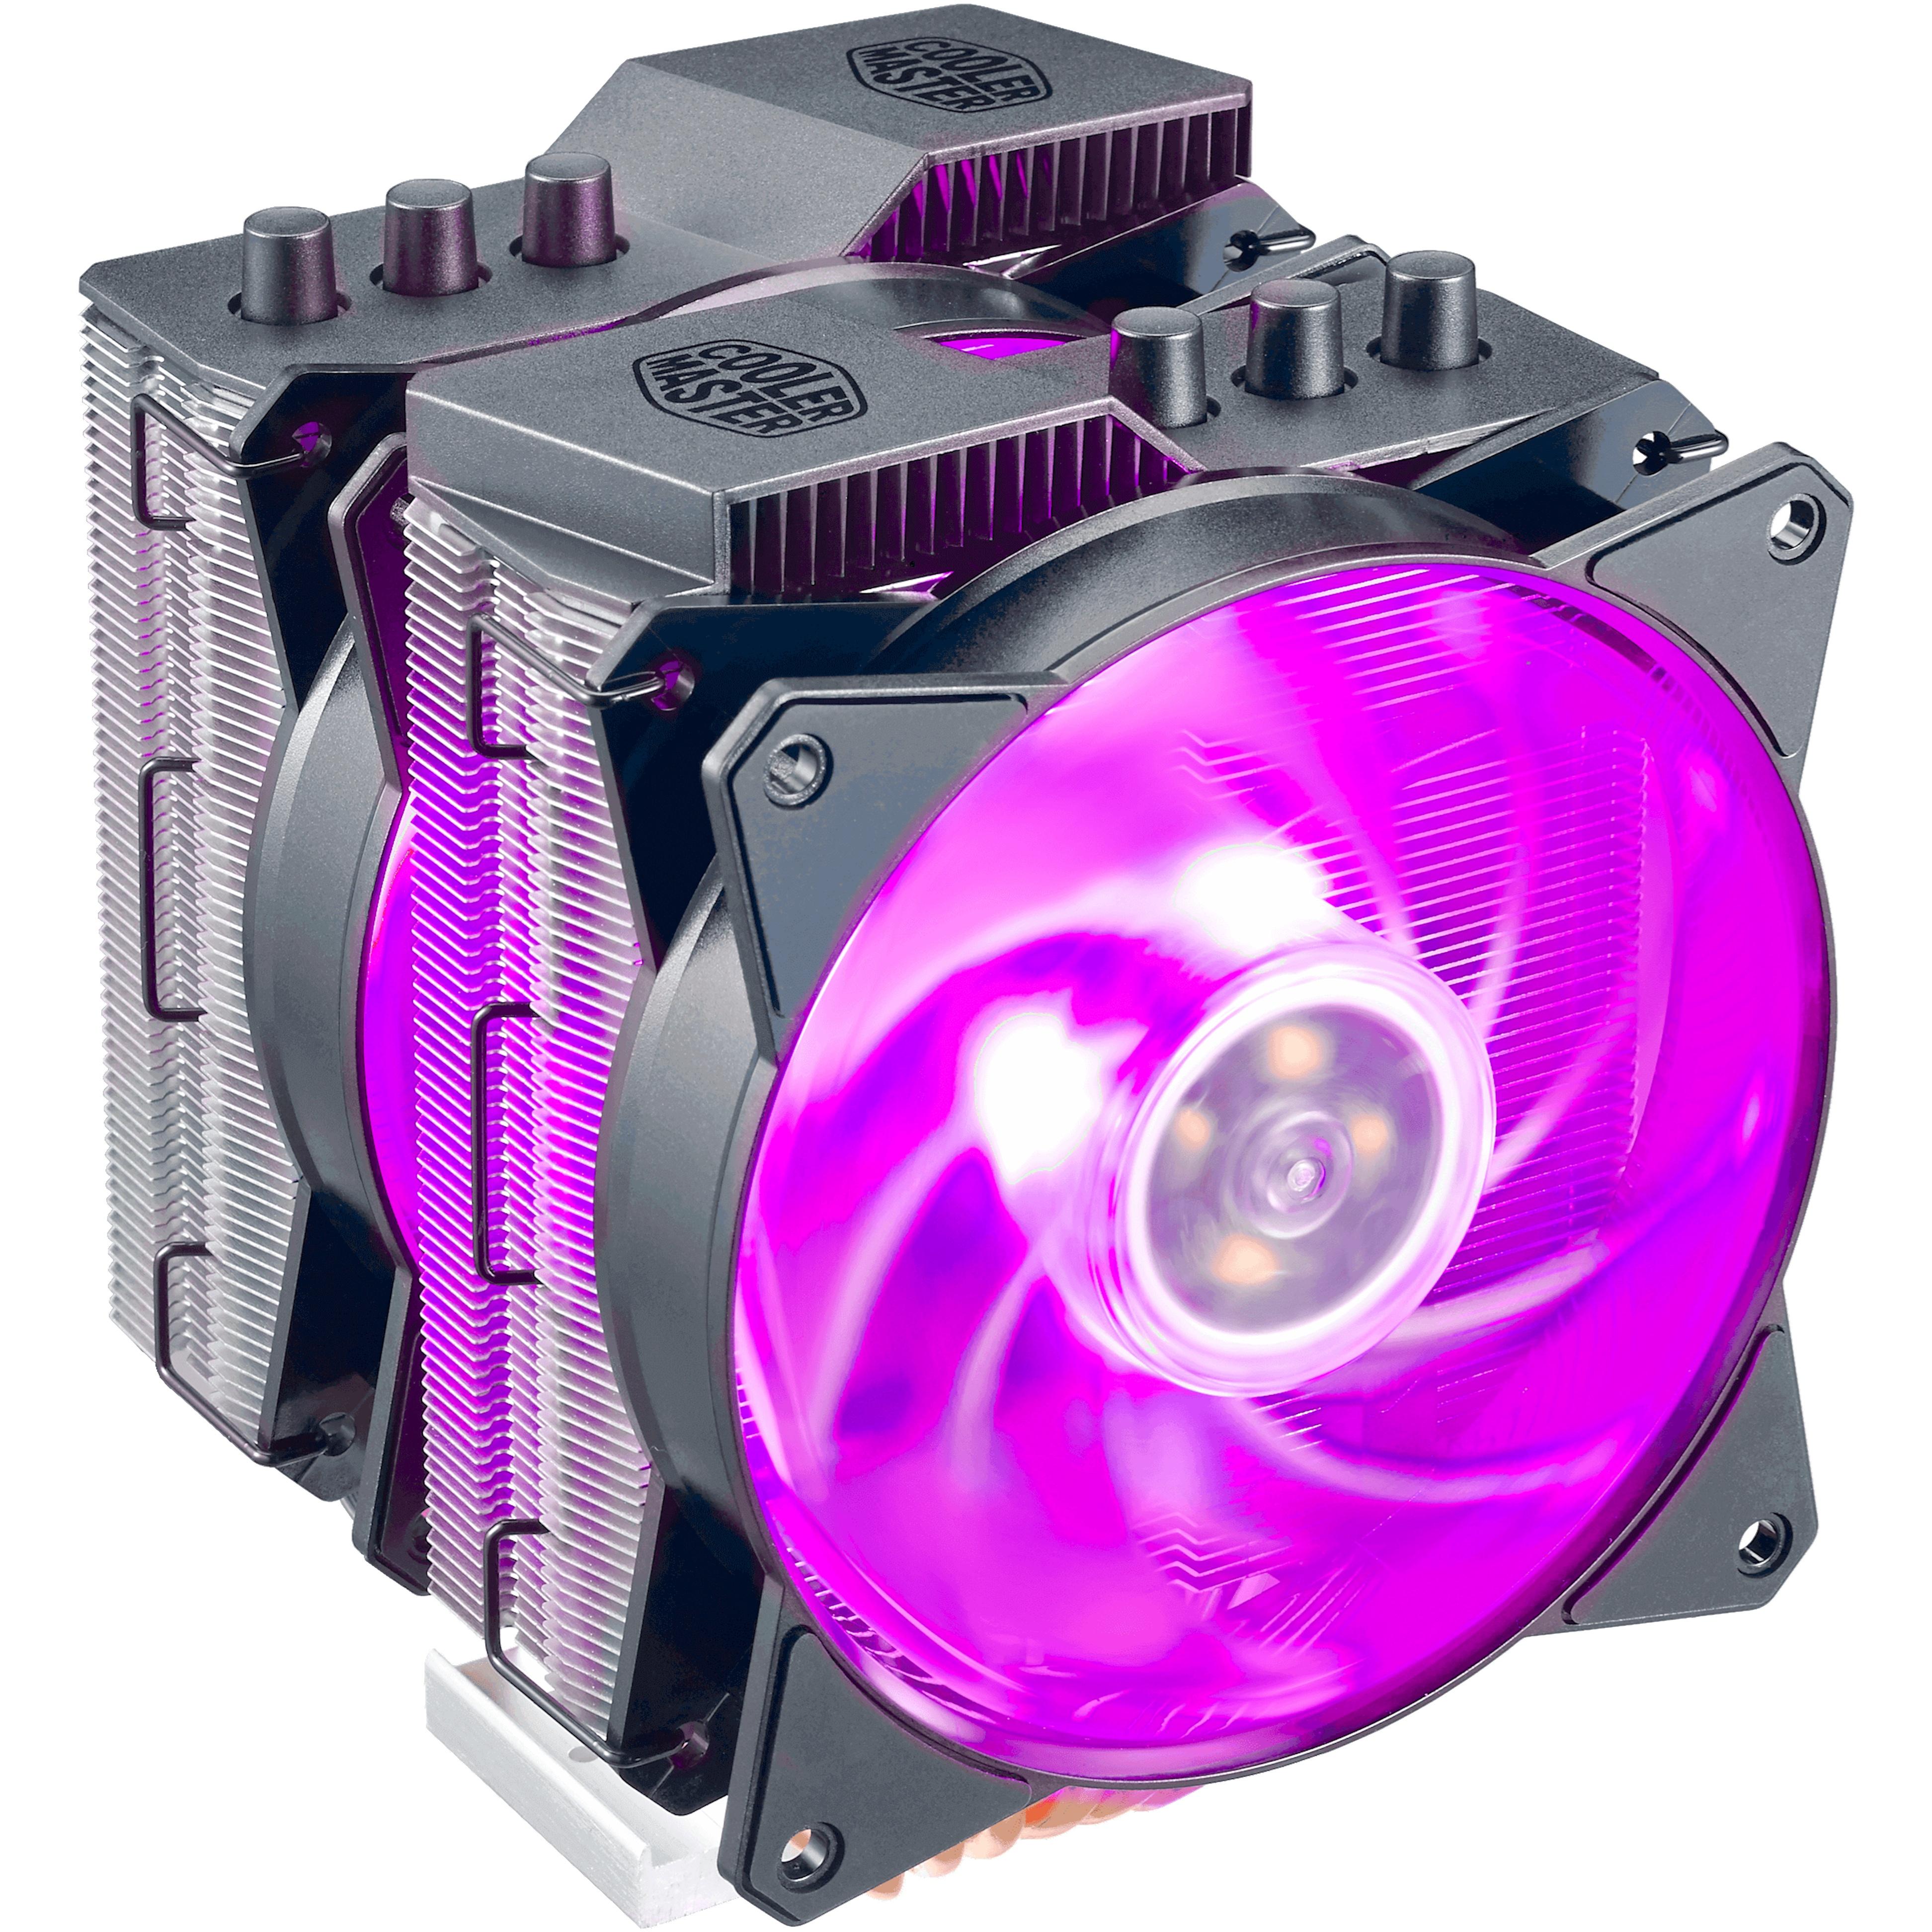 Ventola masterair ma620p, 120*25mm pwm fan, 600-1800rpm, 6x hp, wired rgb controller c10l